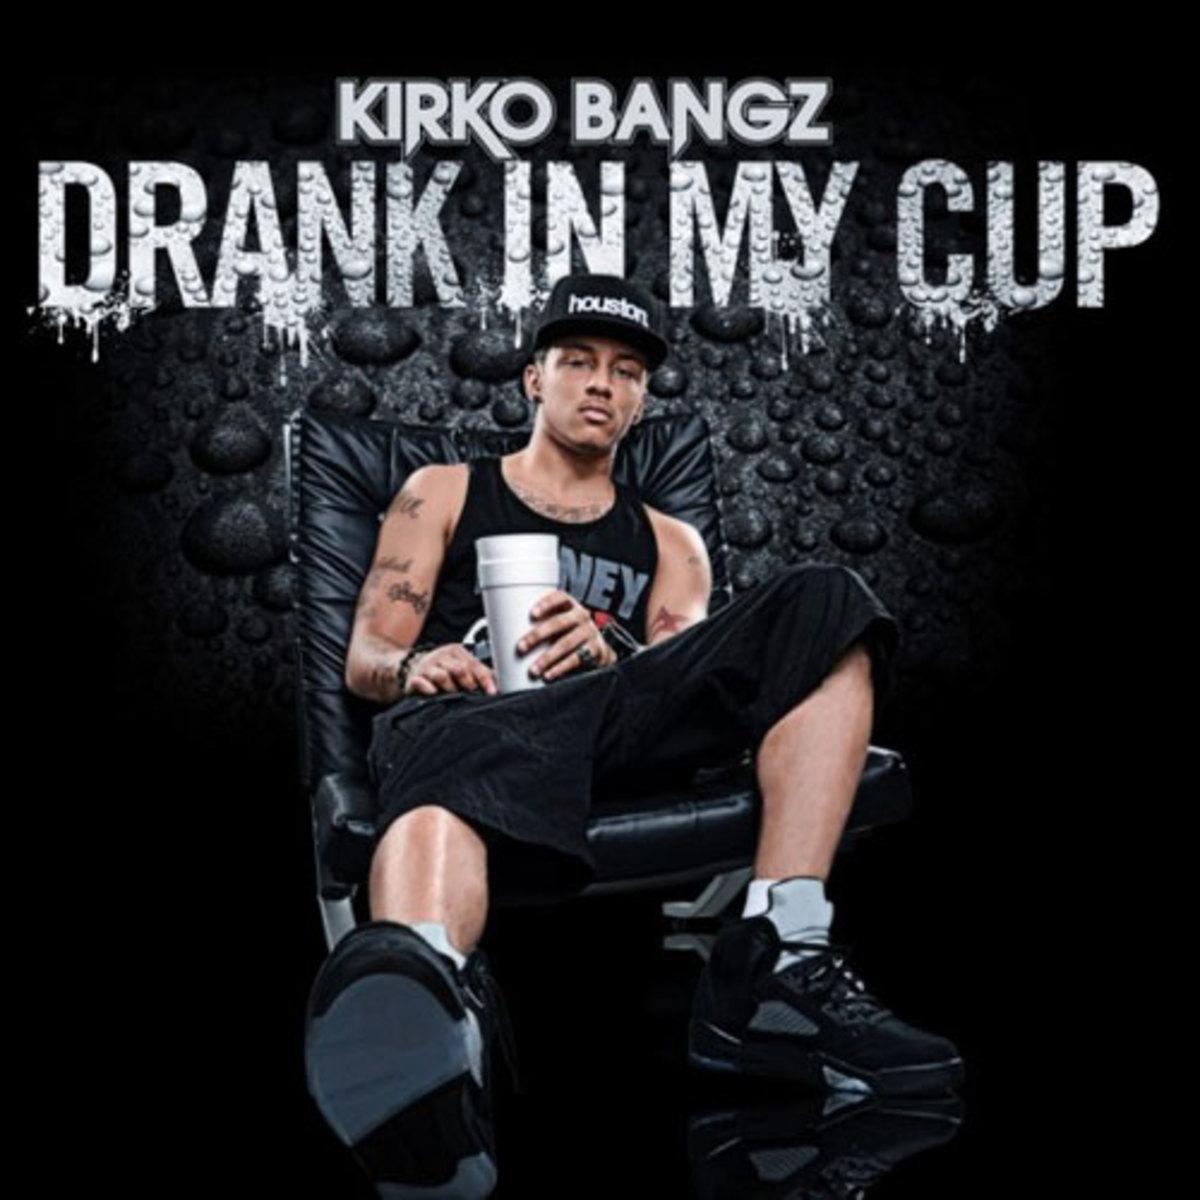 kirkobangz-drankcuprmx.jpg